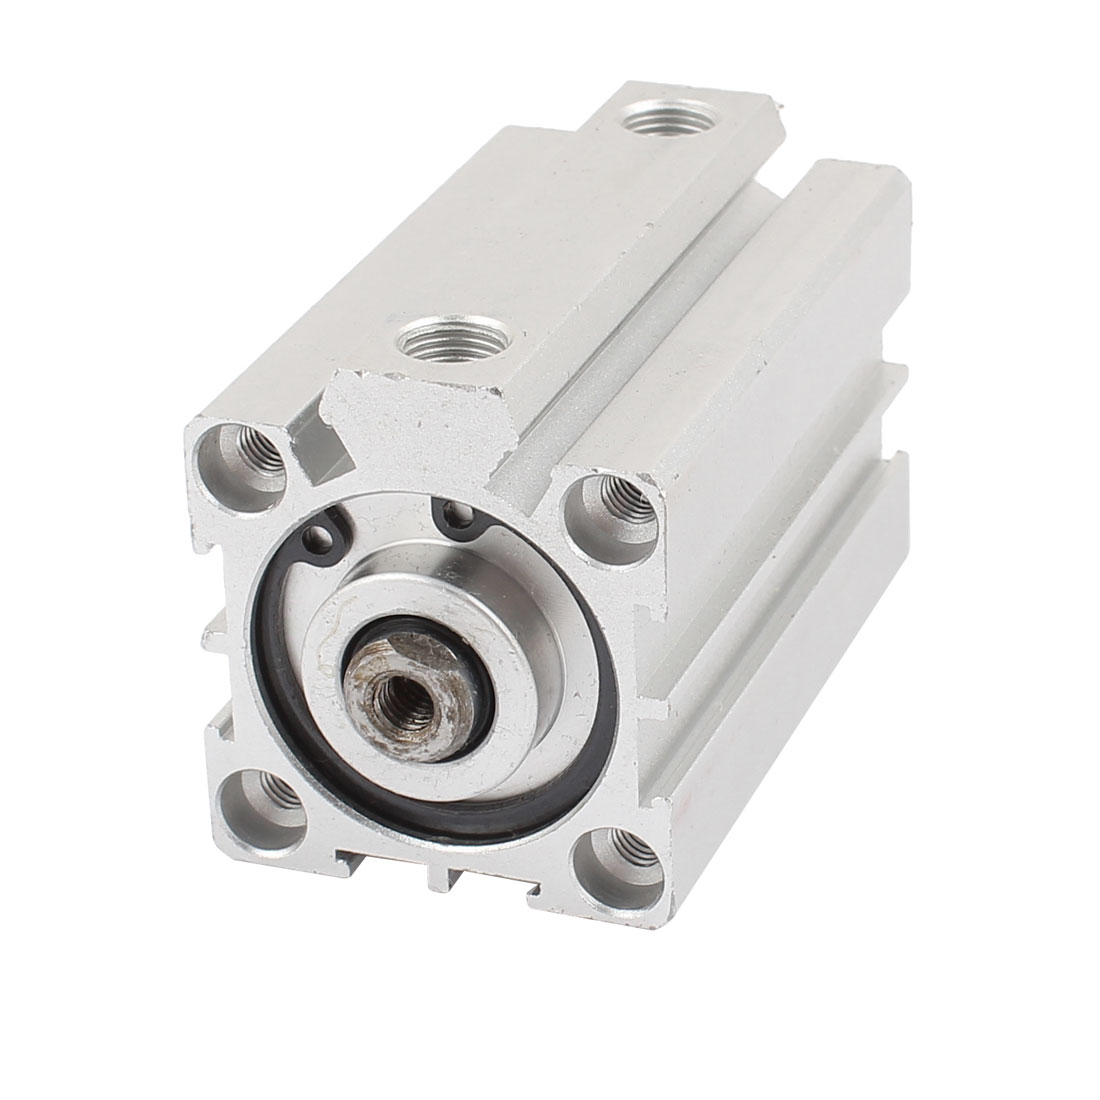 KSDA32x50 50mm Stroke 32mm Bore Aluminium Pneumatic Compact Air Cylinder